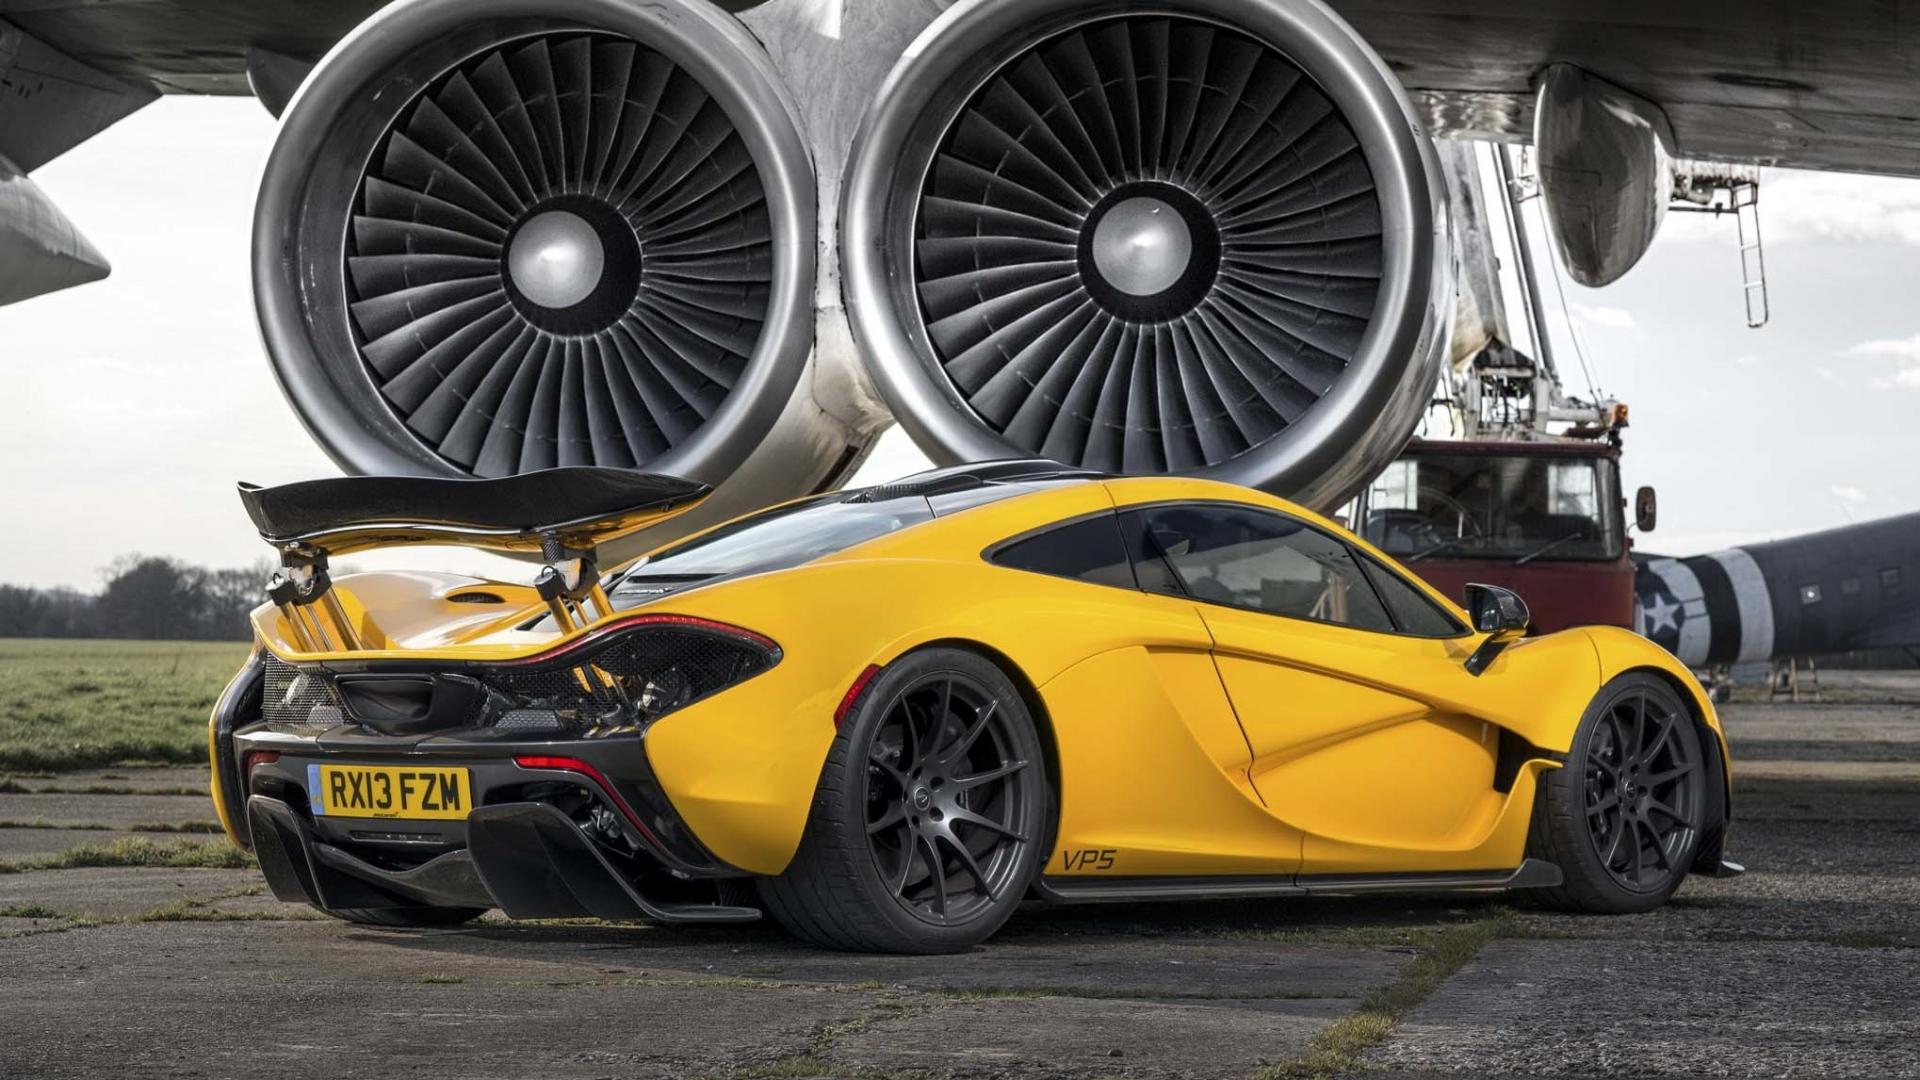 Download Wallpaper 1920x1080 Mclaren P1 Turbines Yellow Supercar Full Hd 1080p Hd Background